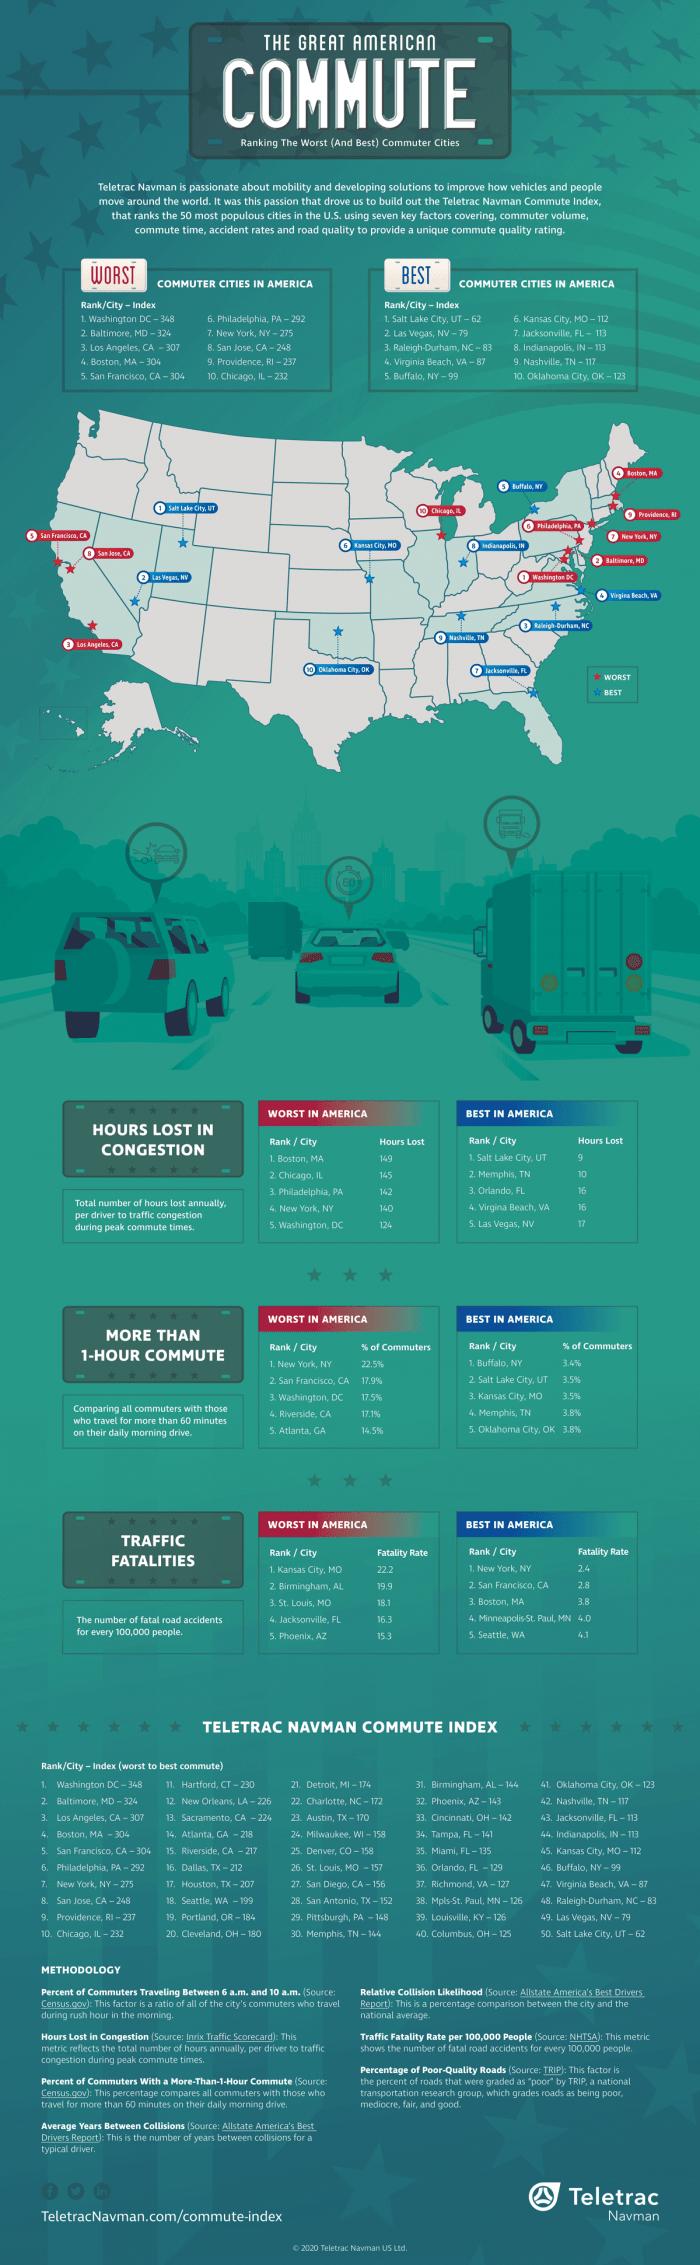 Best/Worst Commutes In America